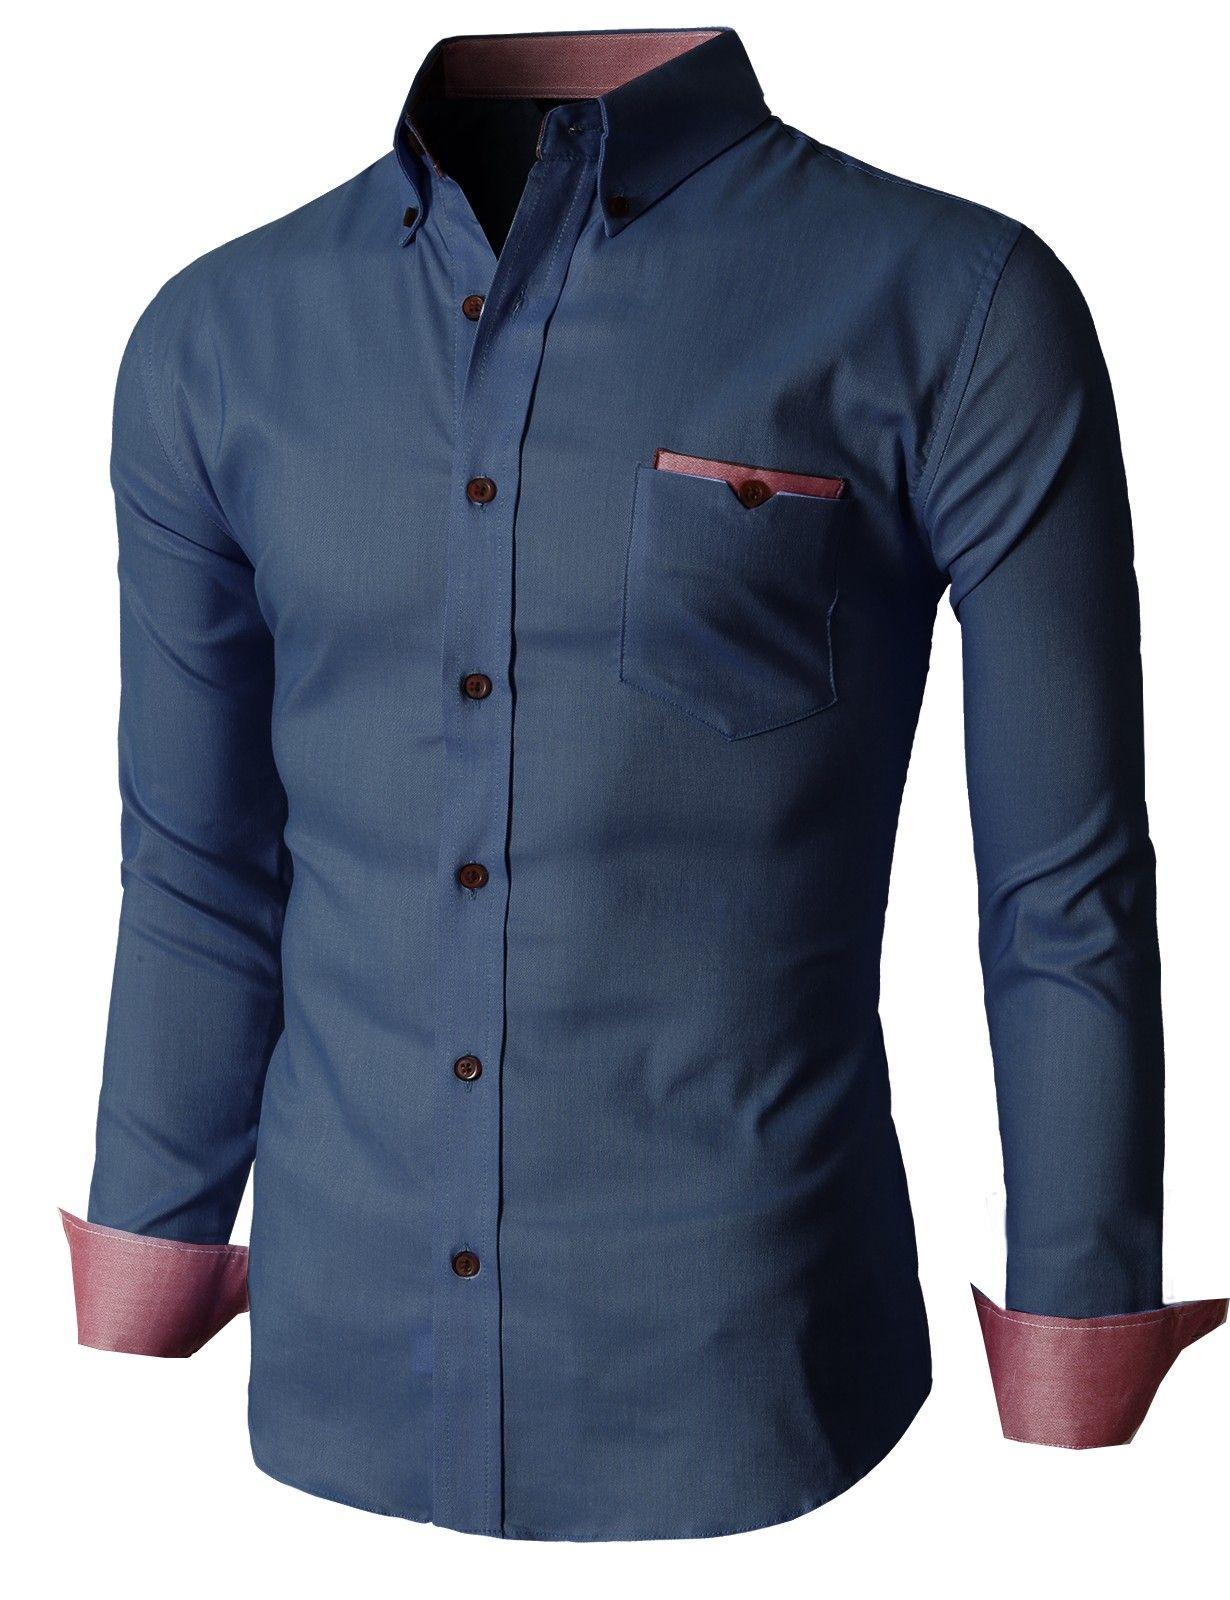 e6fa2f49bf8  35.99 Doublju Men s Oxford Shirts with Leather Point Pocket (KMTSTL0201)